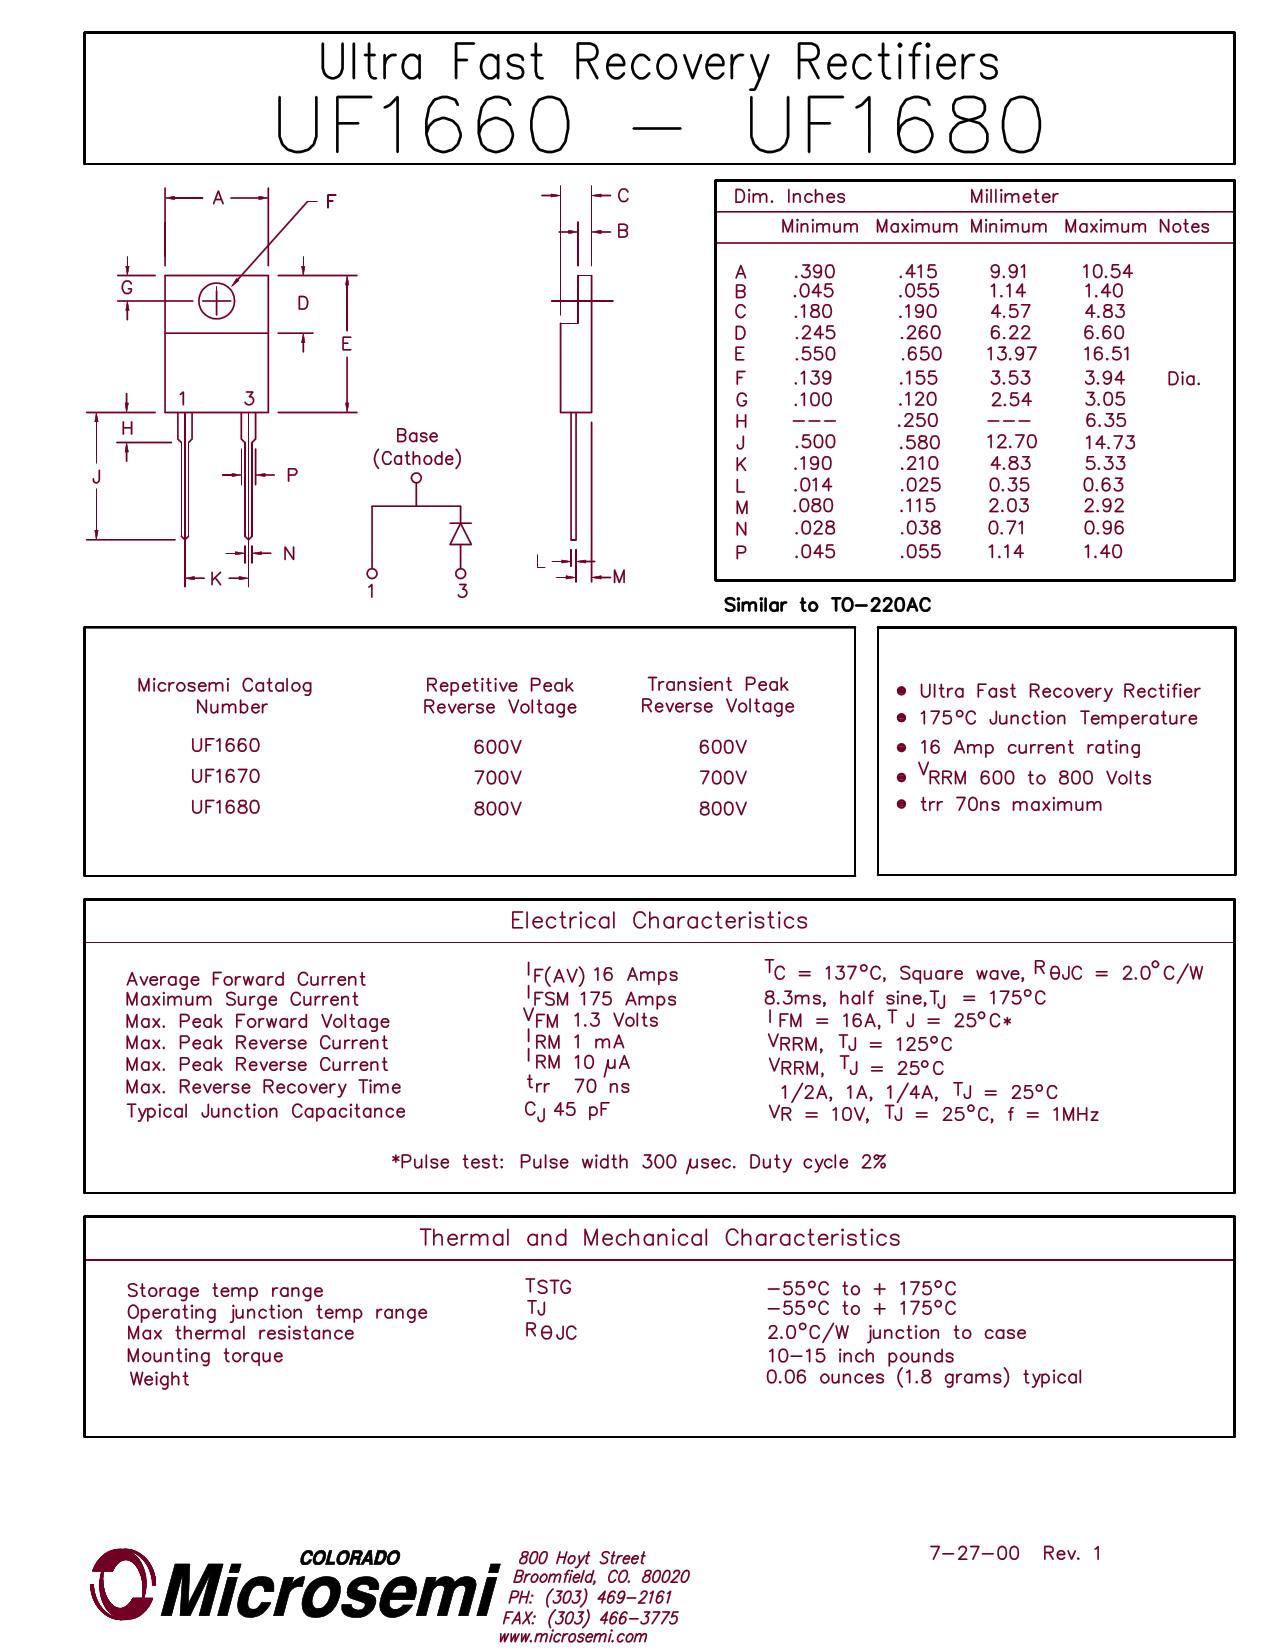 UF1680 데이터시트 및 UF1680 PDF